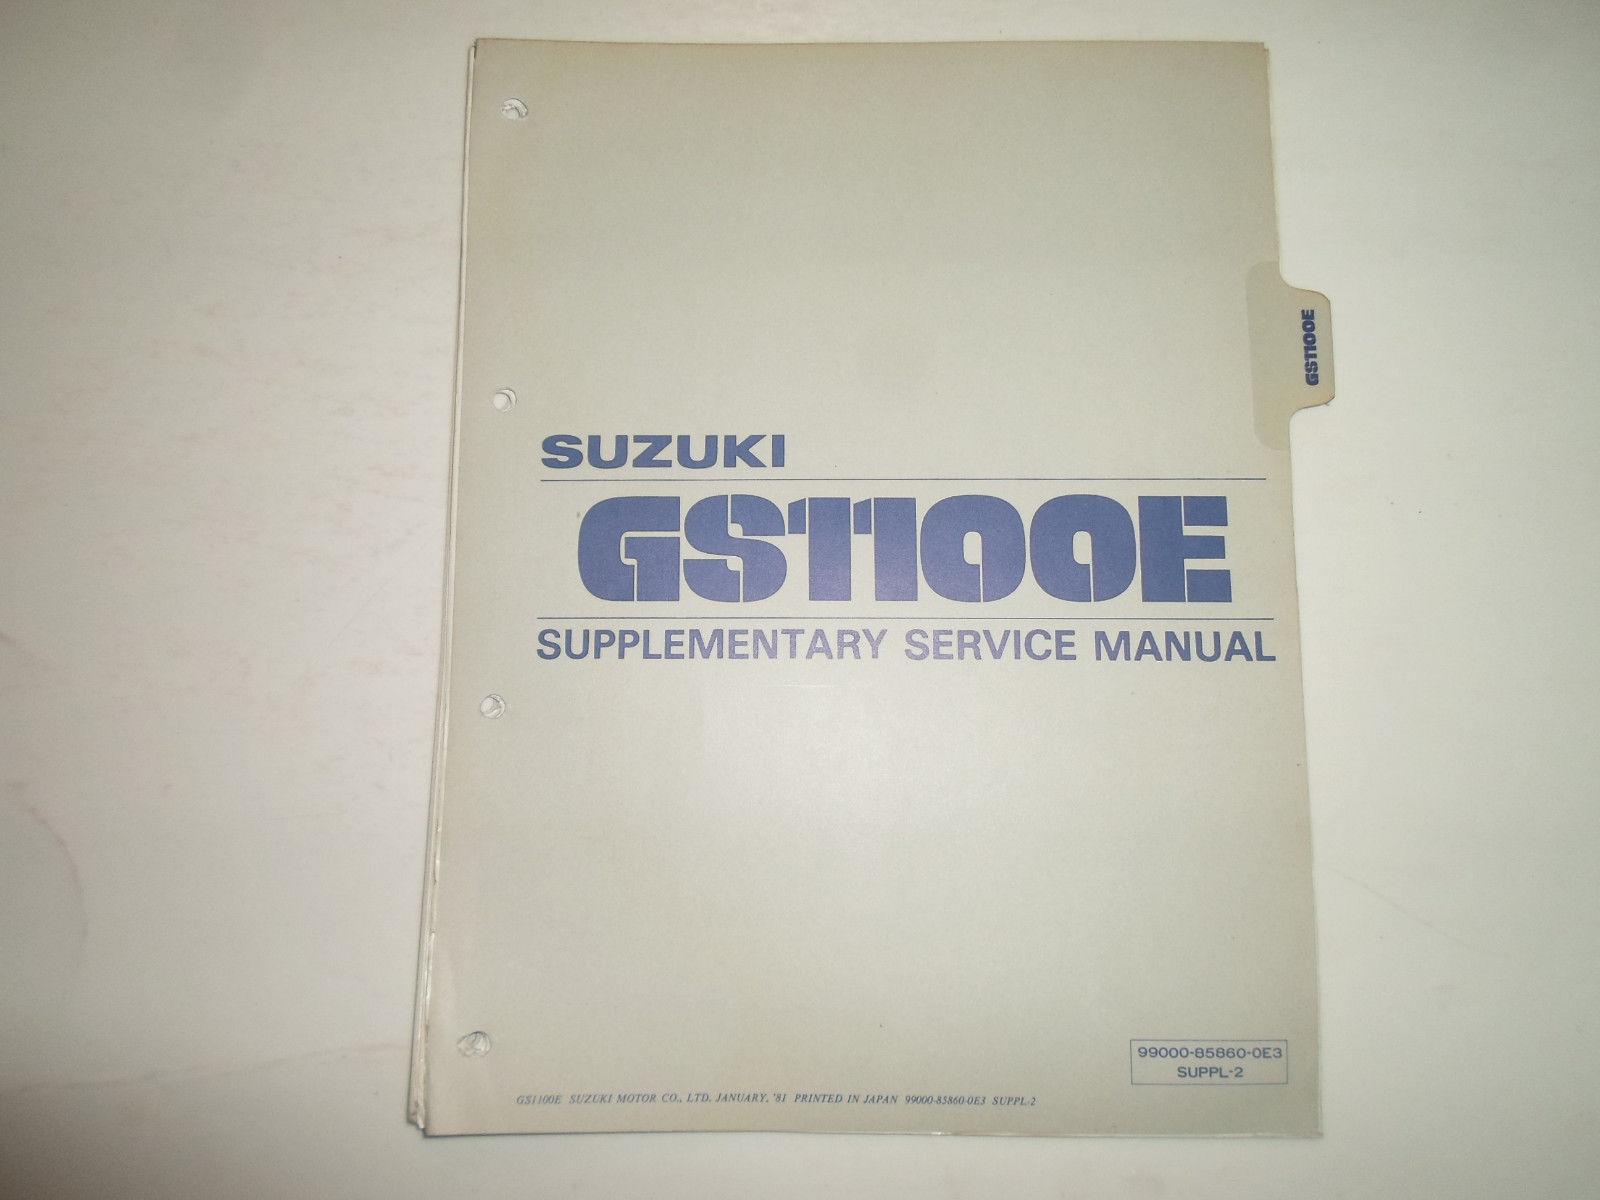 1981 Suzuki Gs1100 E Supplementary Service and 50 similar items